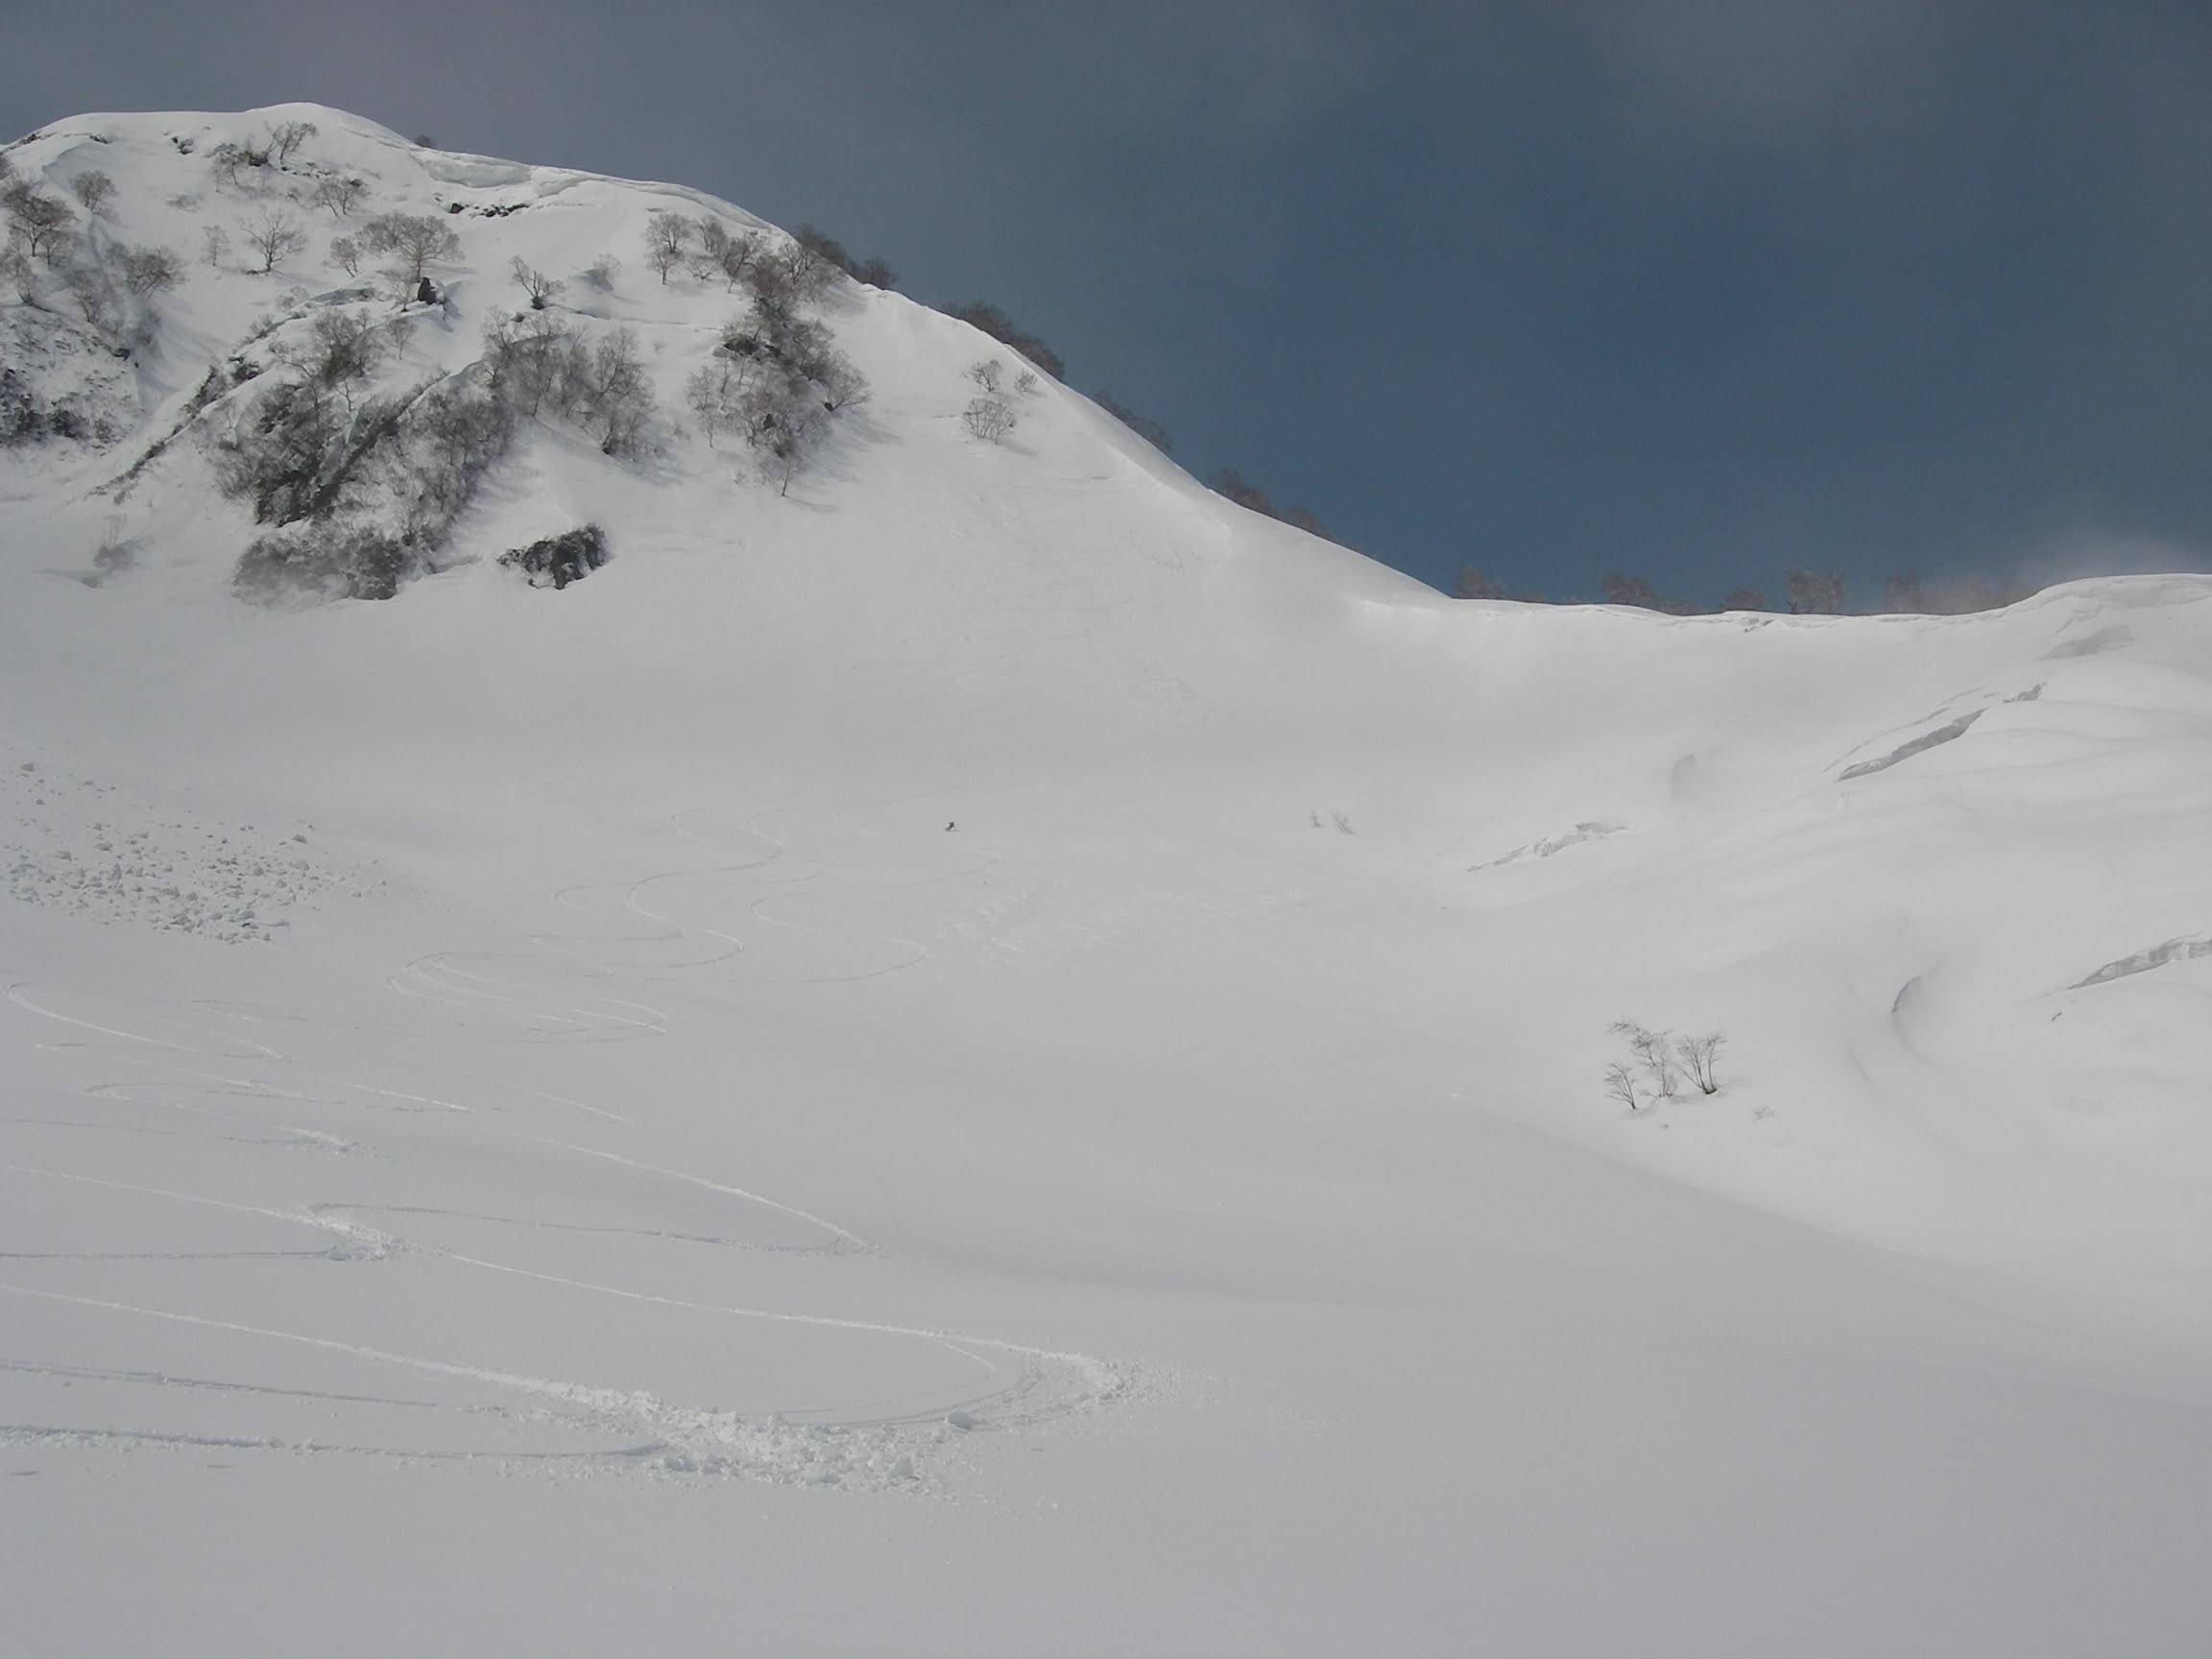 スキー日記-50日目-火打山・黒菱岳 - My favorite things-white, white!